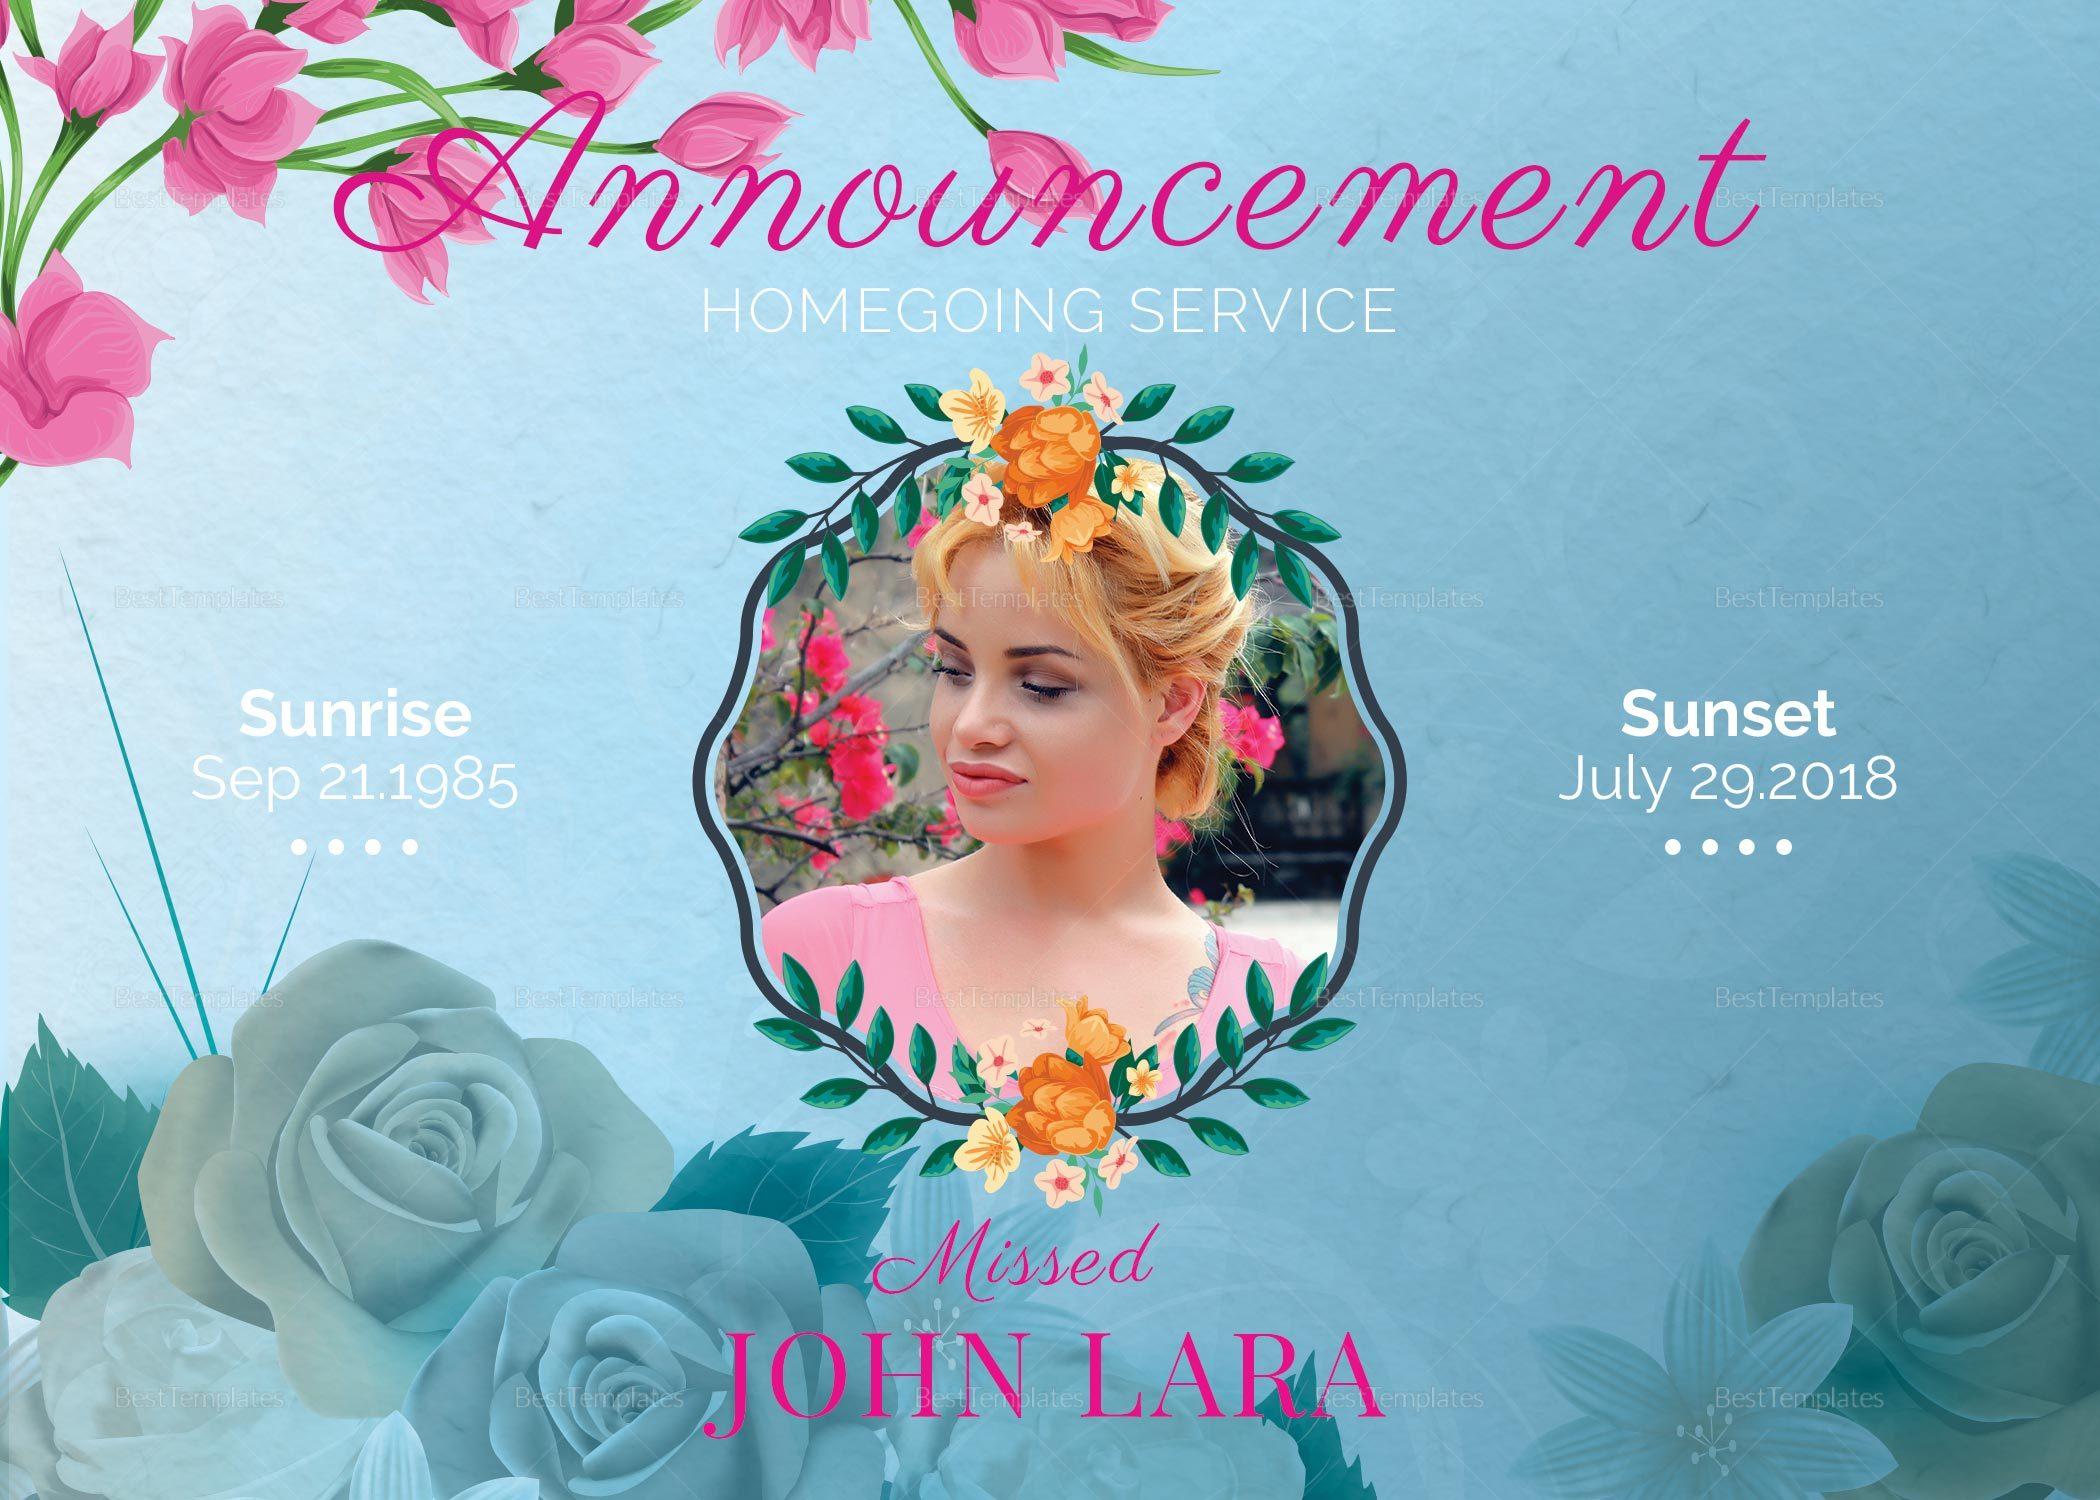 Floral Funeral Announcement